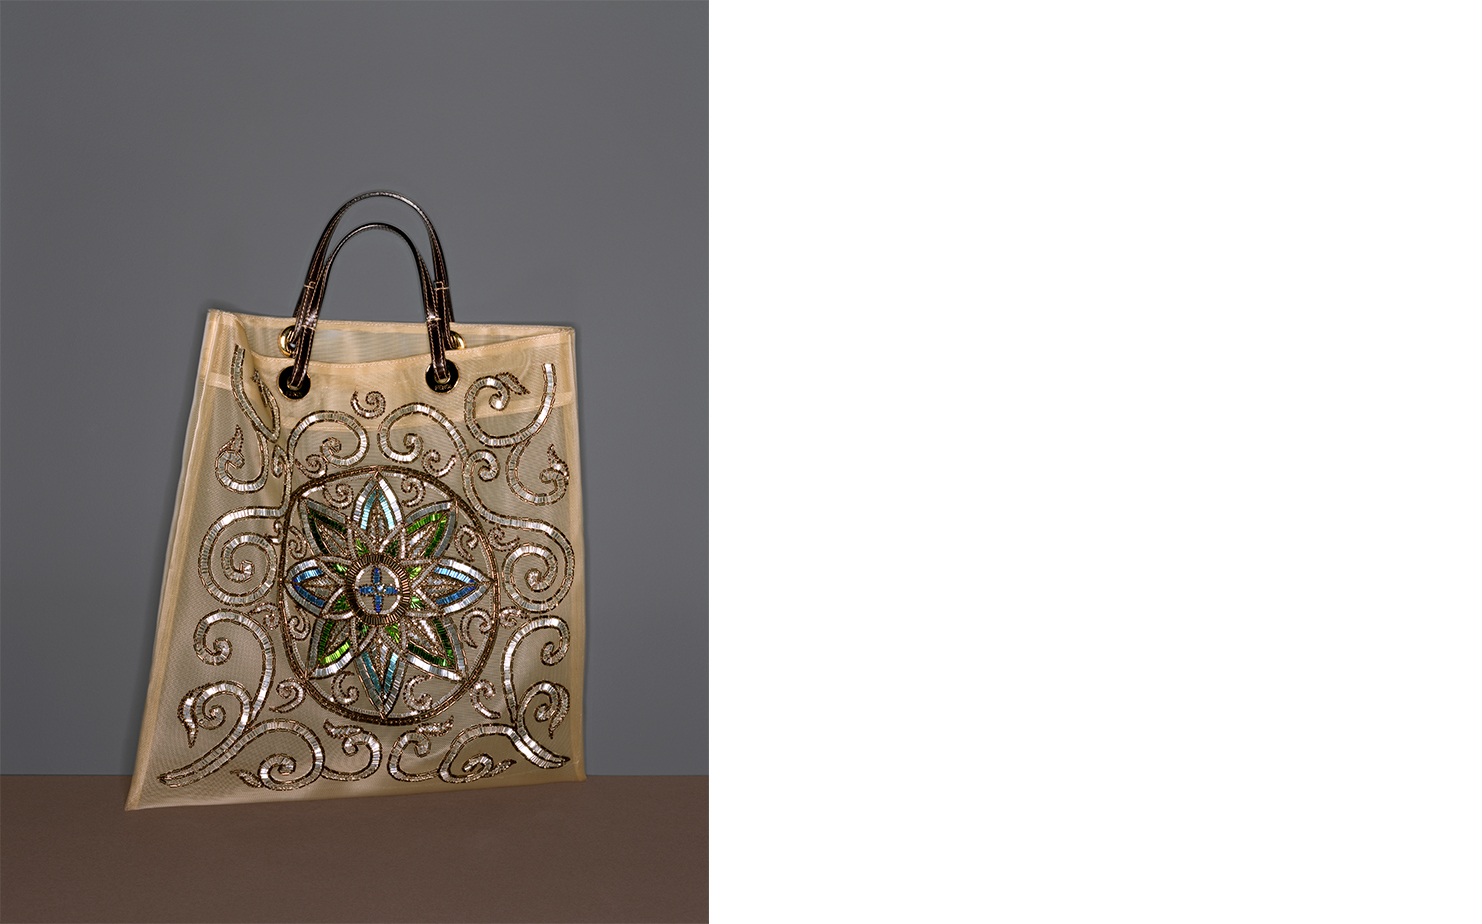 Harper's Bazaar   FENDI FETISH   FASHION EDITOR Richard Sinnott CREATIVE DIRECTOR Fabien Baron